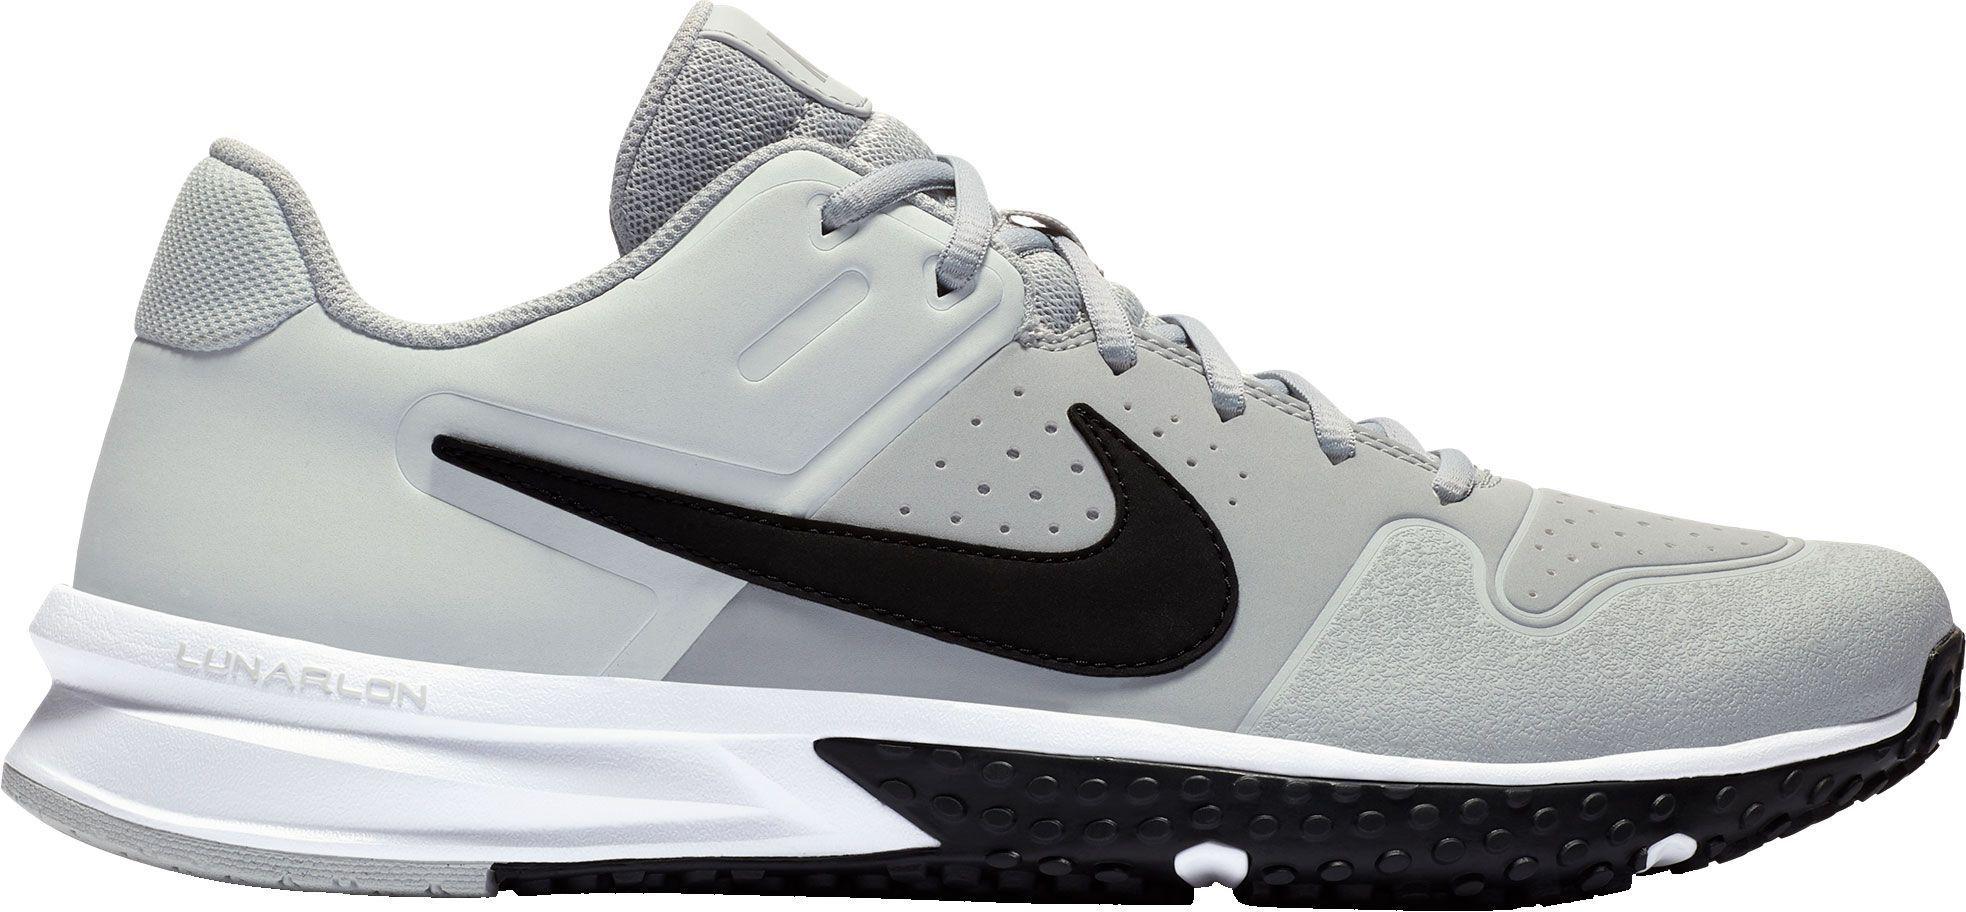 bdf4f1e3df6 Nike Men's Alpha Huarache Varsity Turf Baseball Cleats in 2019 ...